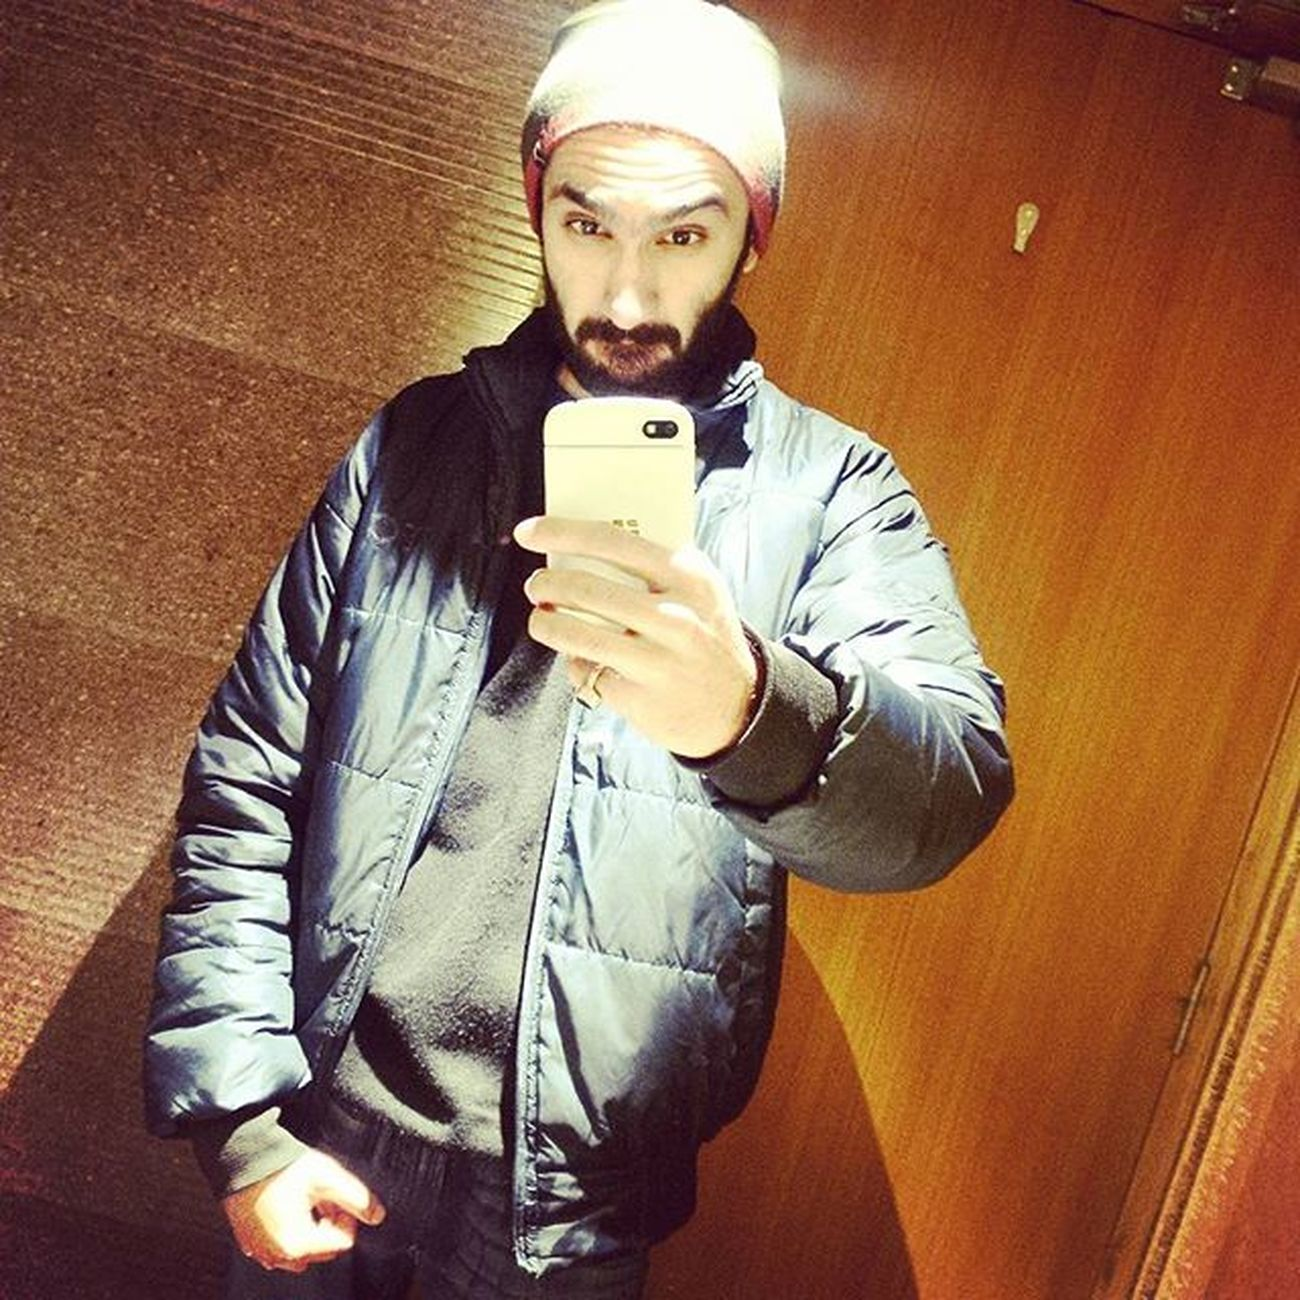 Winter is coming. x Winter Nights  Dilli Delhidiaries DelhiGram Beard Beardgang Blackberryq10 DelhiLove Bomberjacket NYC Sodelhi 600thpost